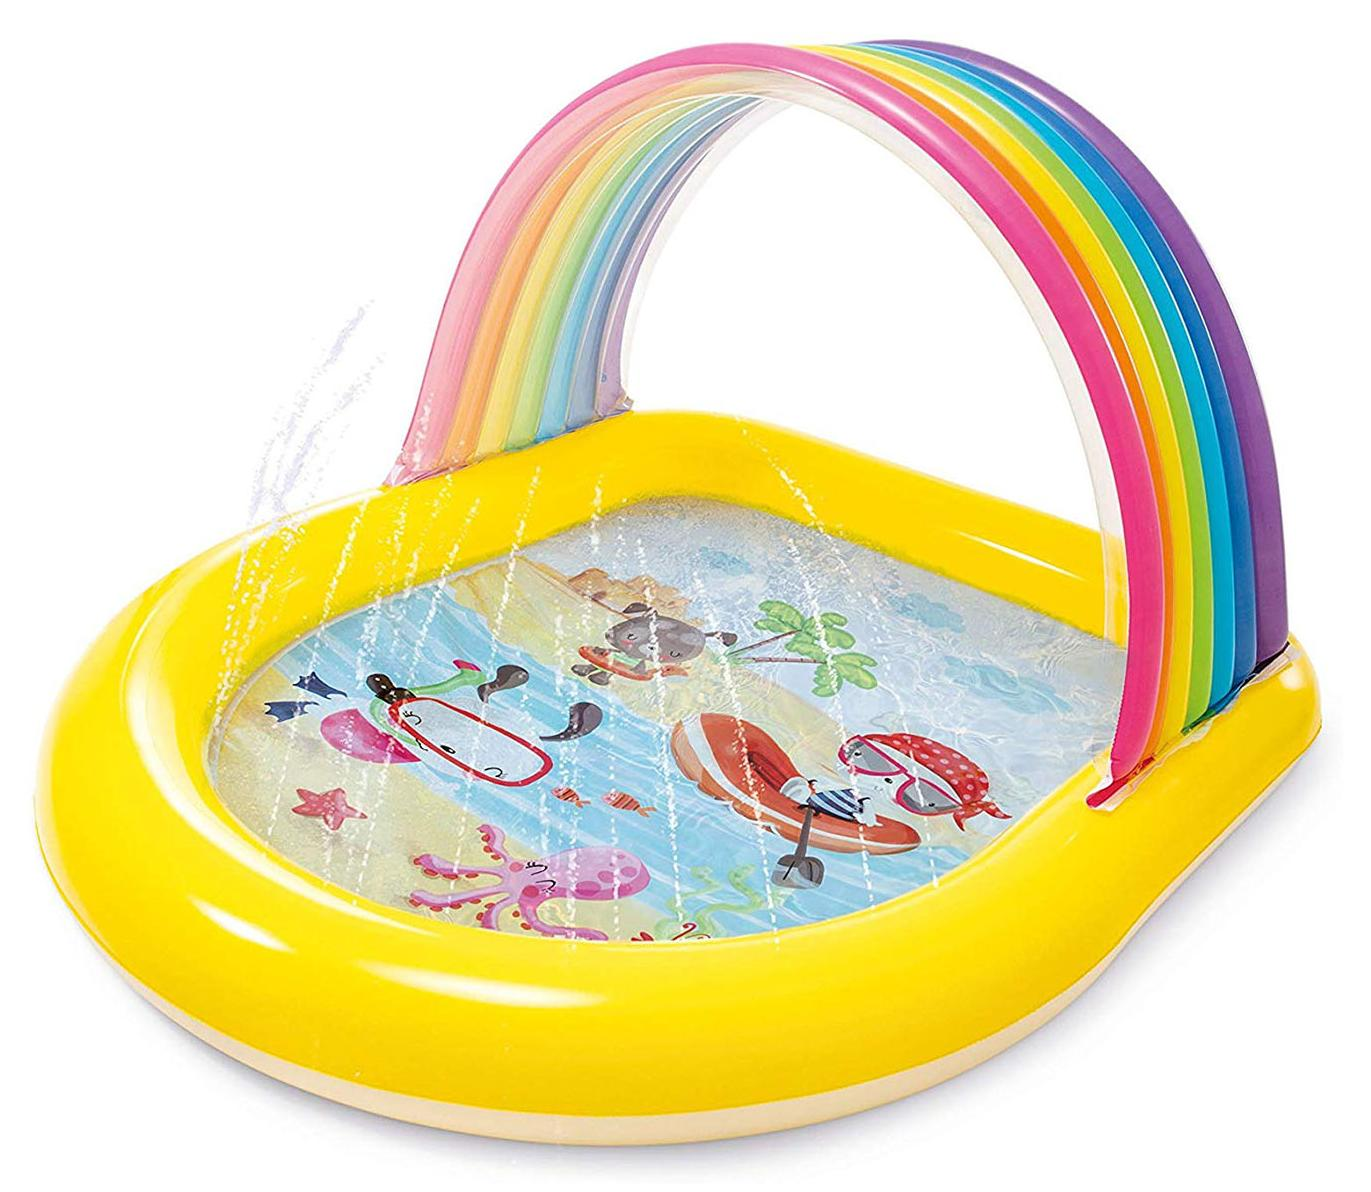 Купить Бассейн с аркой Intex 147х130х86 см, Детские бассейны